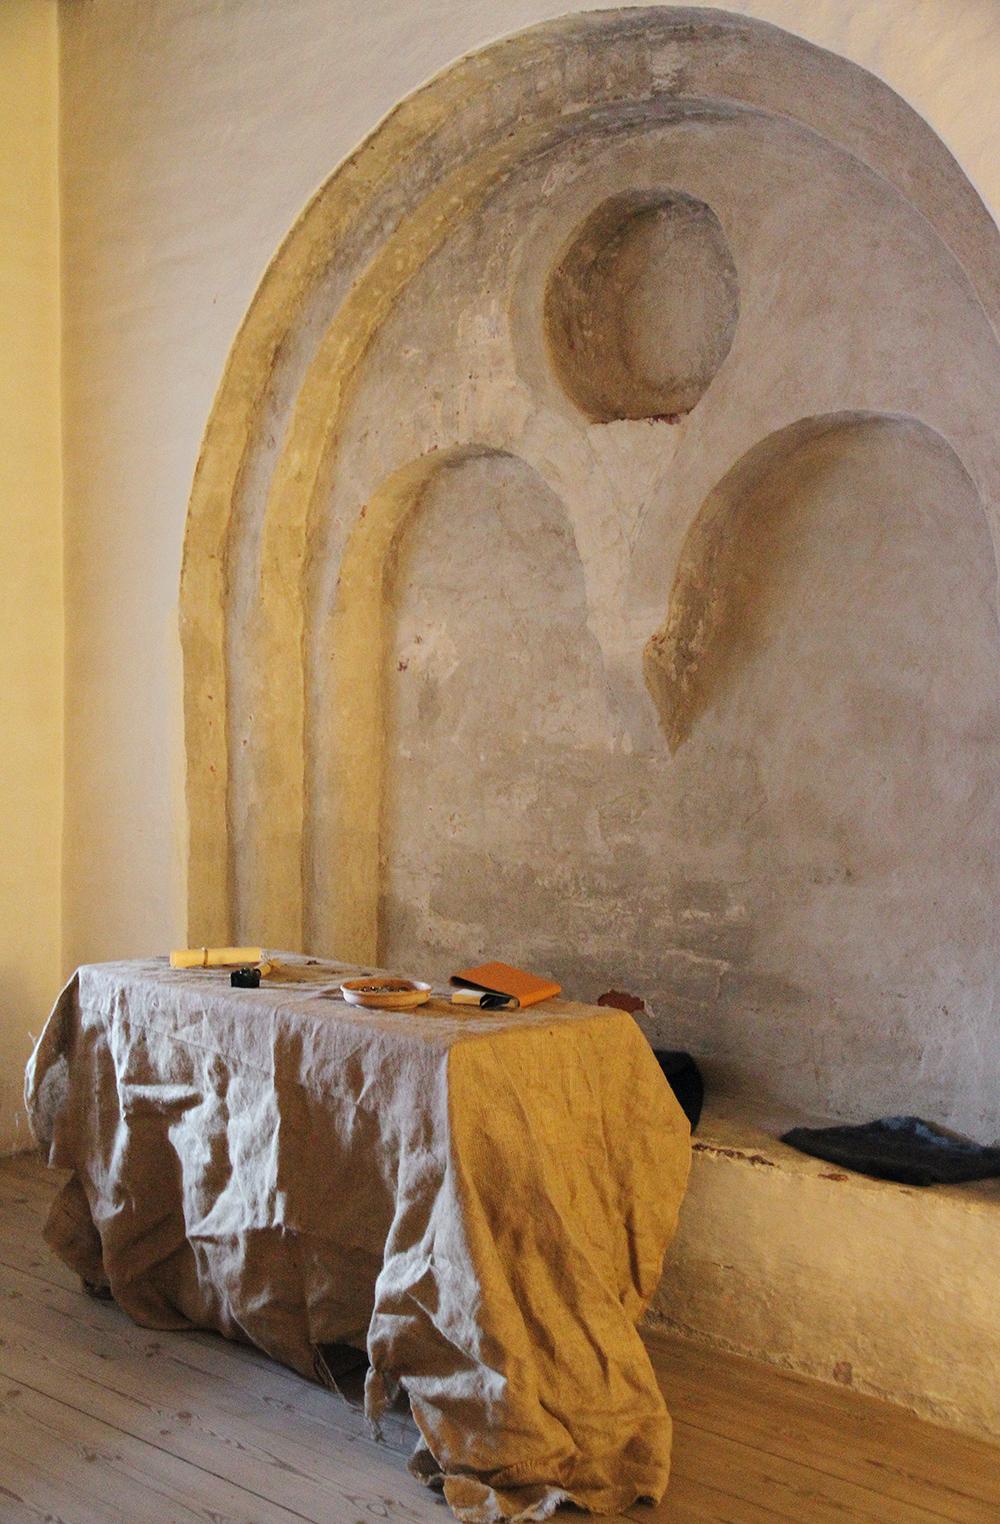 hunajaista hameen linna kirjurinsali